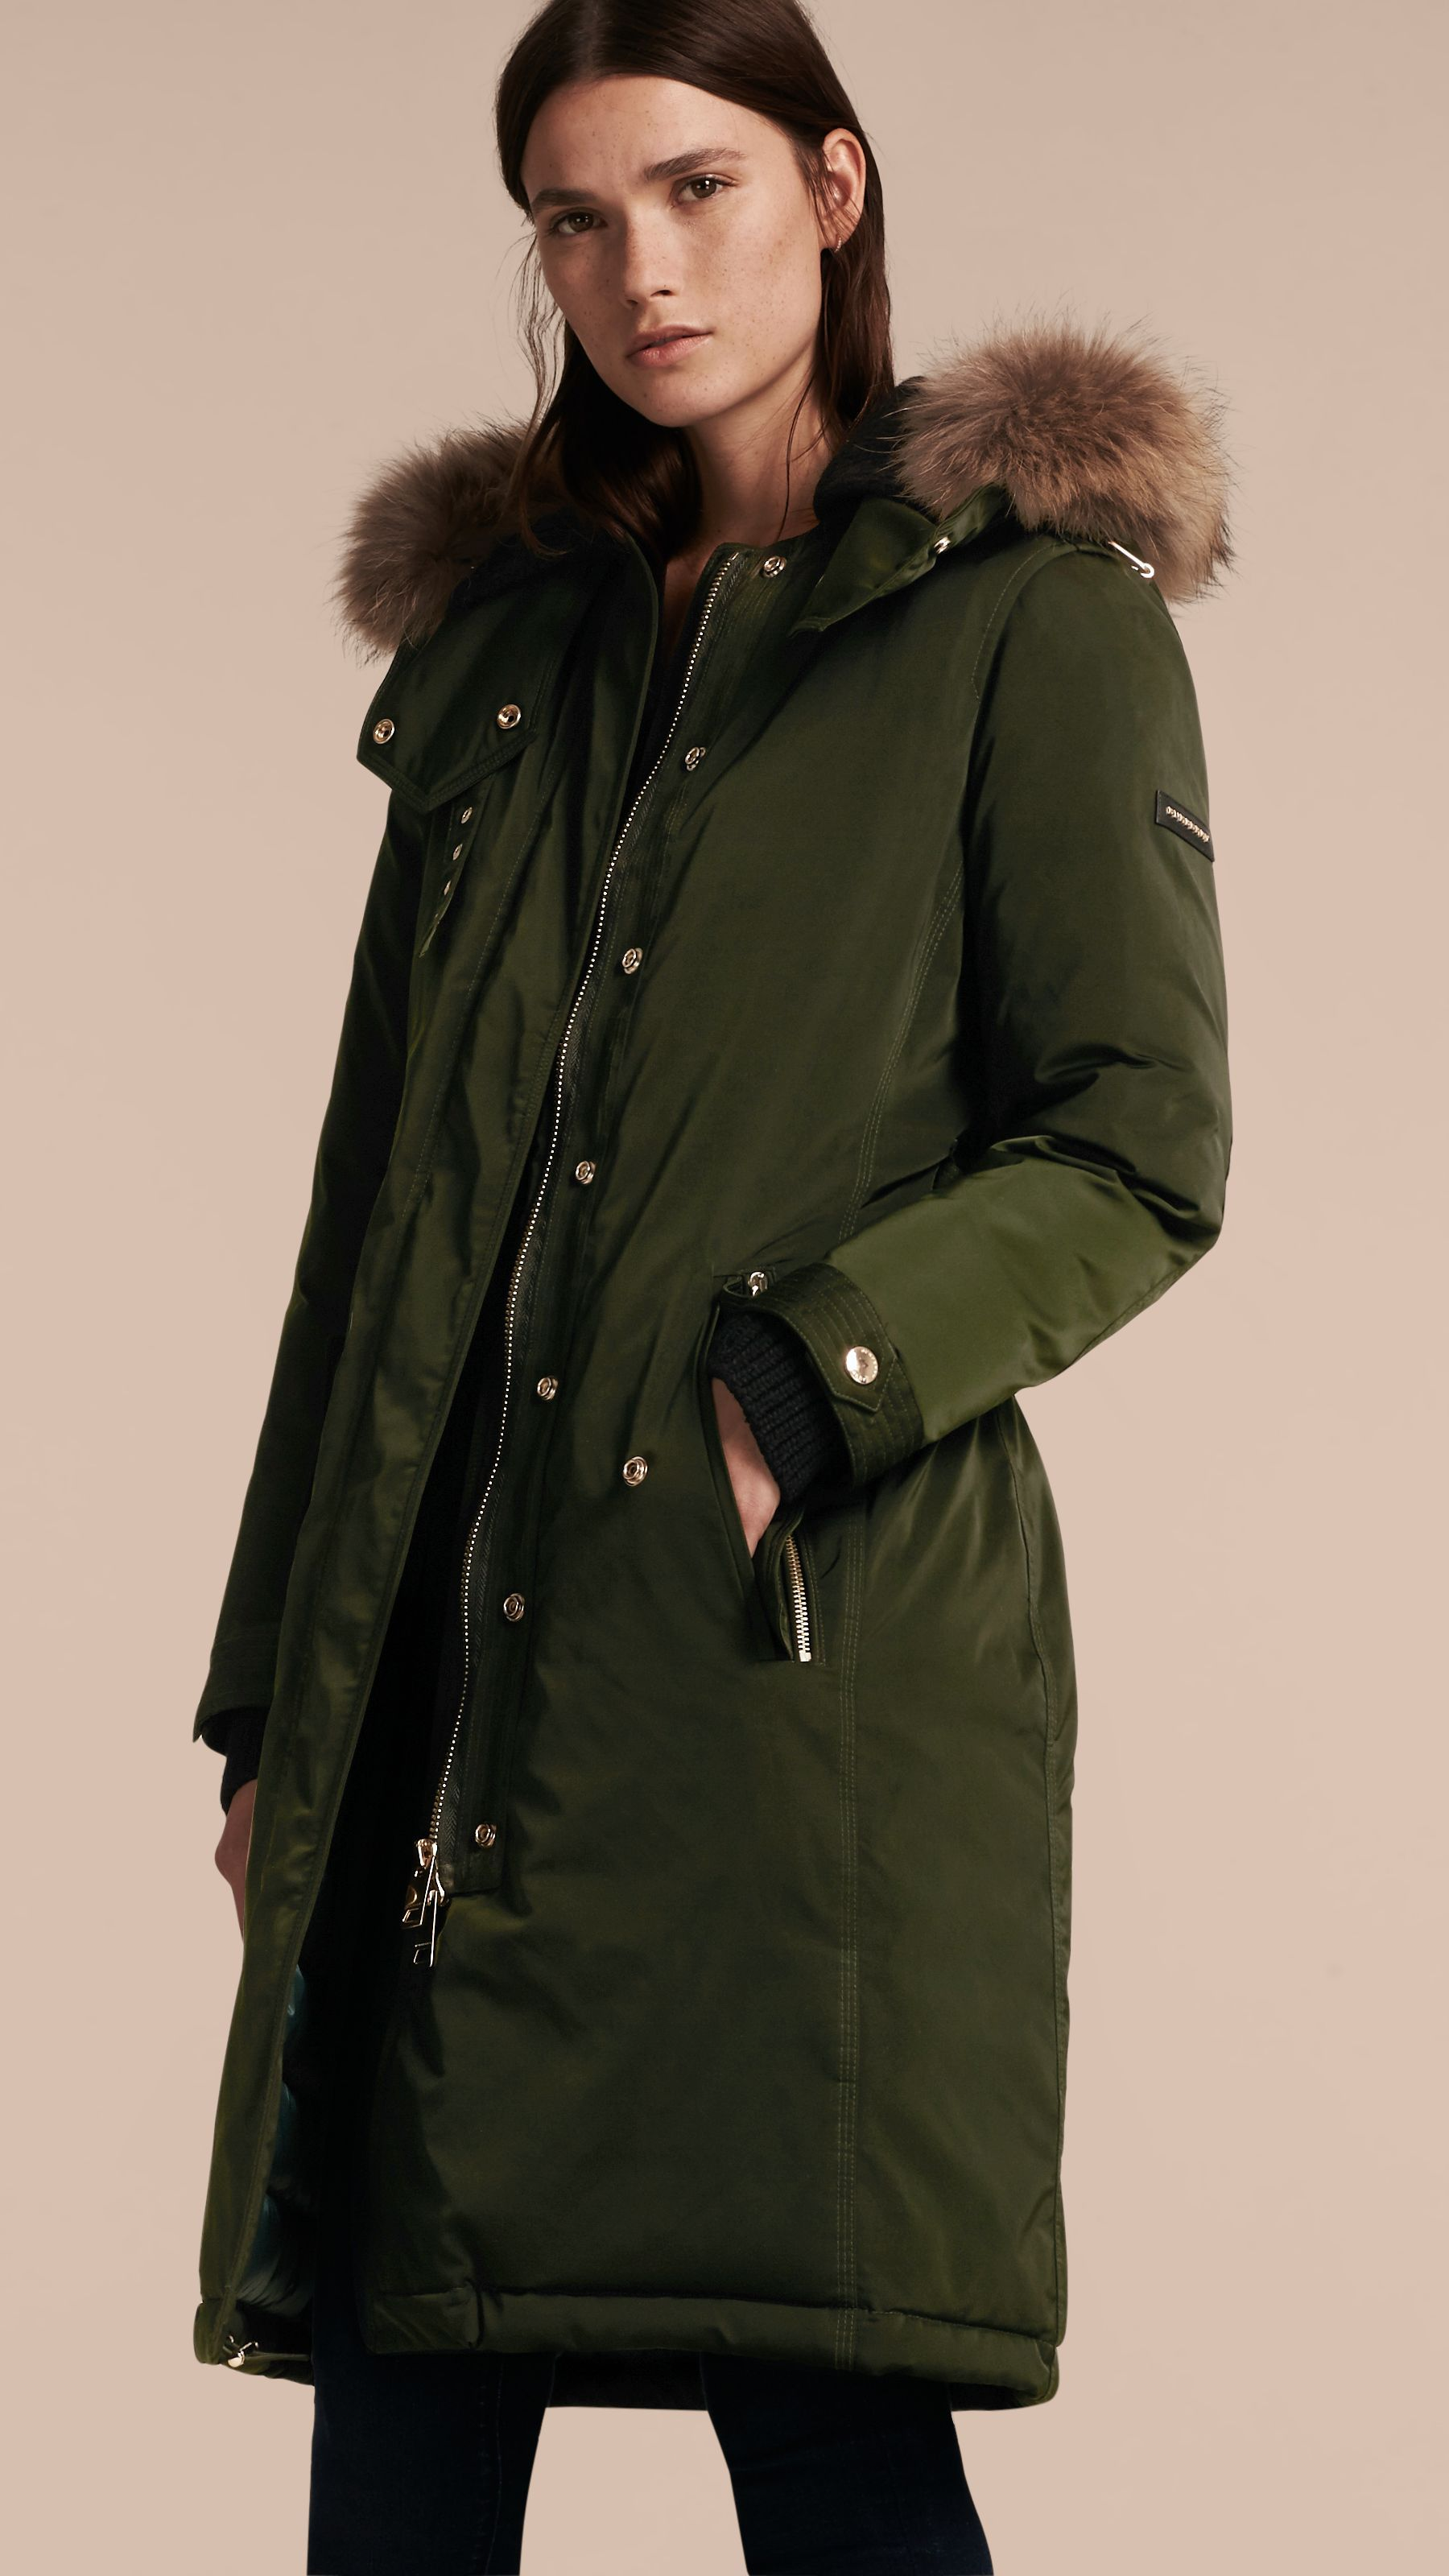 Down-filled Parka Coat with Detachable Fur Trim in Dark Cedar ...